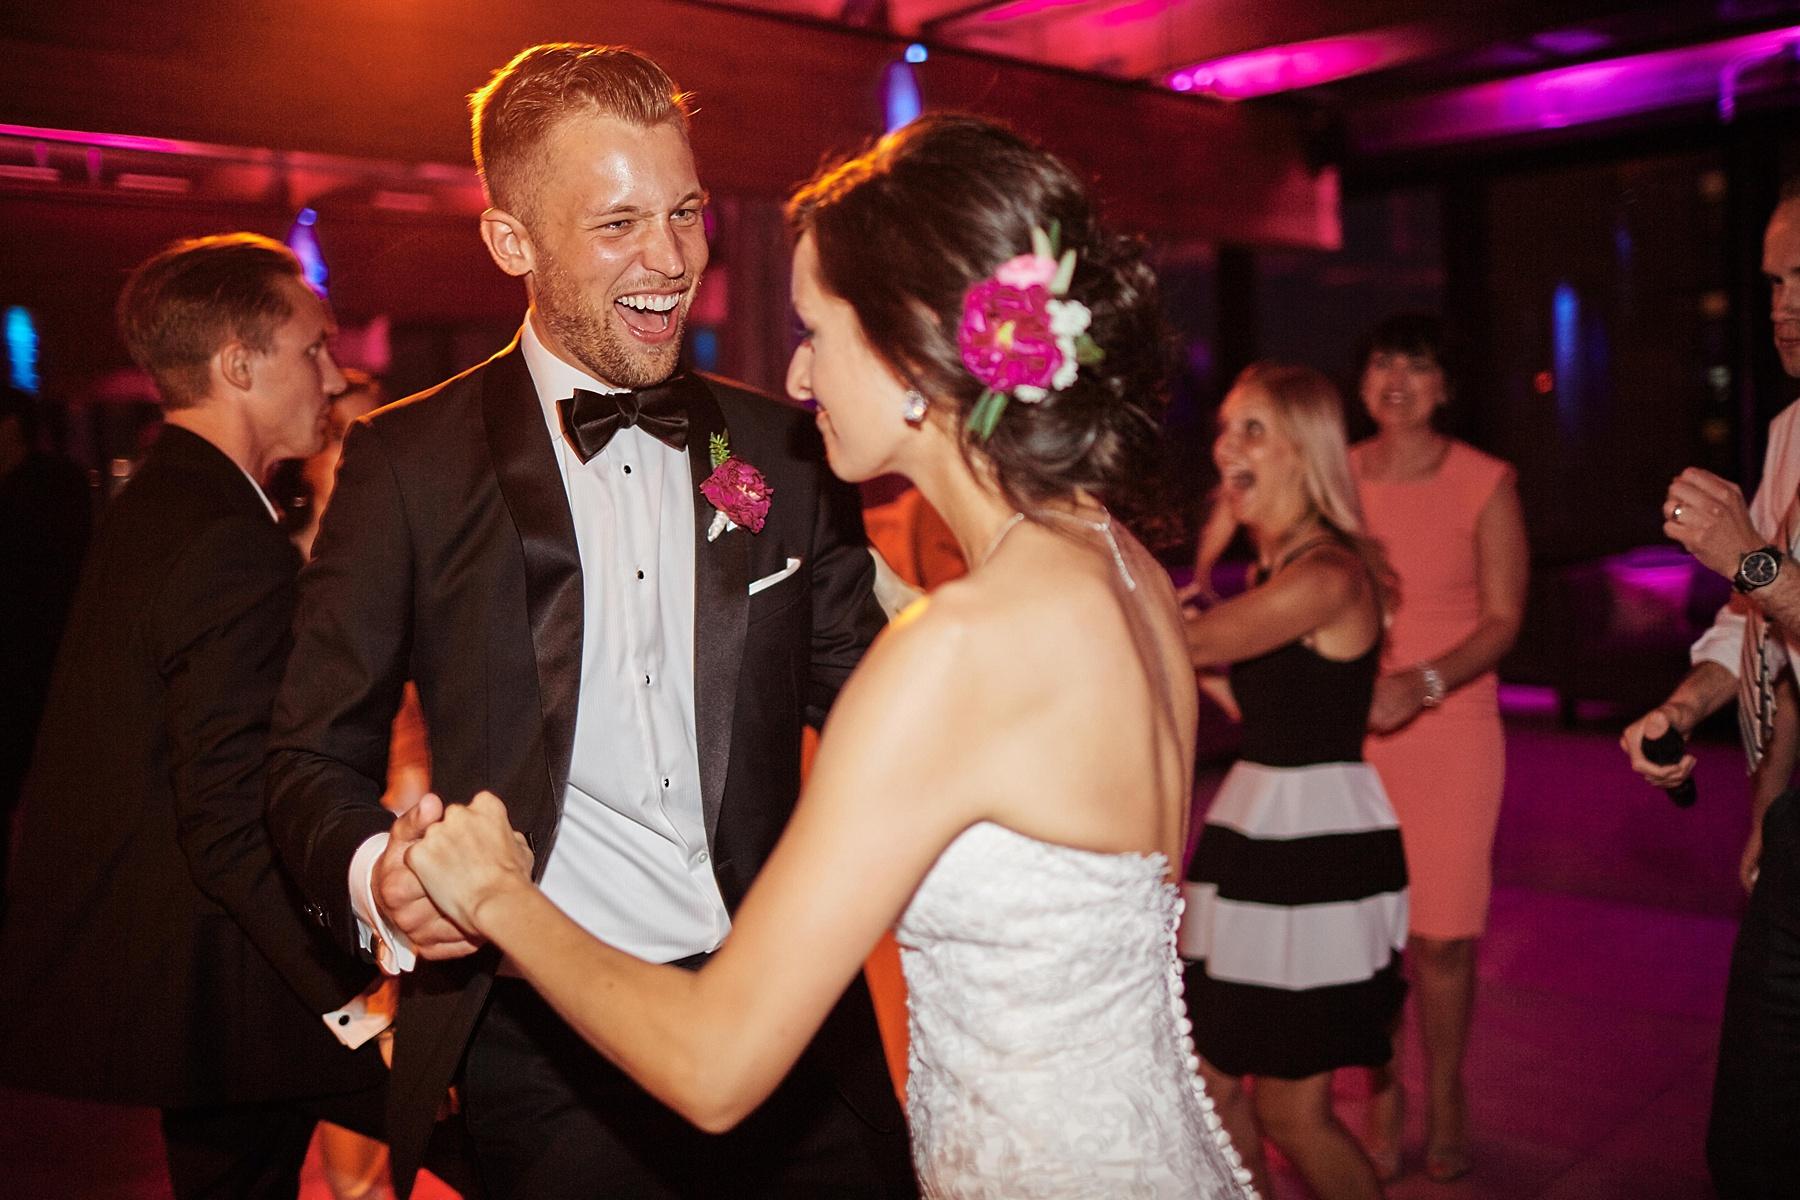 ABULAE-Wedding-Saint-paul-MN-Josh-Sofia-Wedding-Mears-Park_0858.jpg